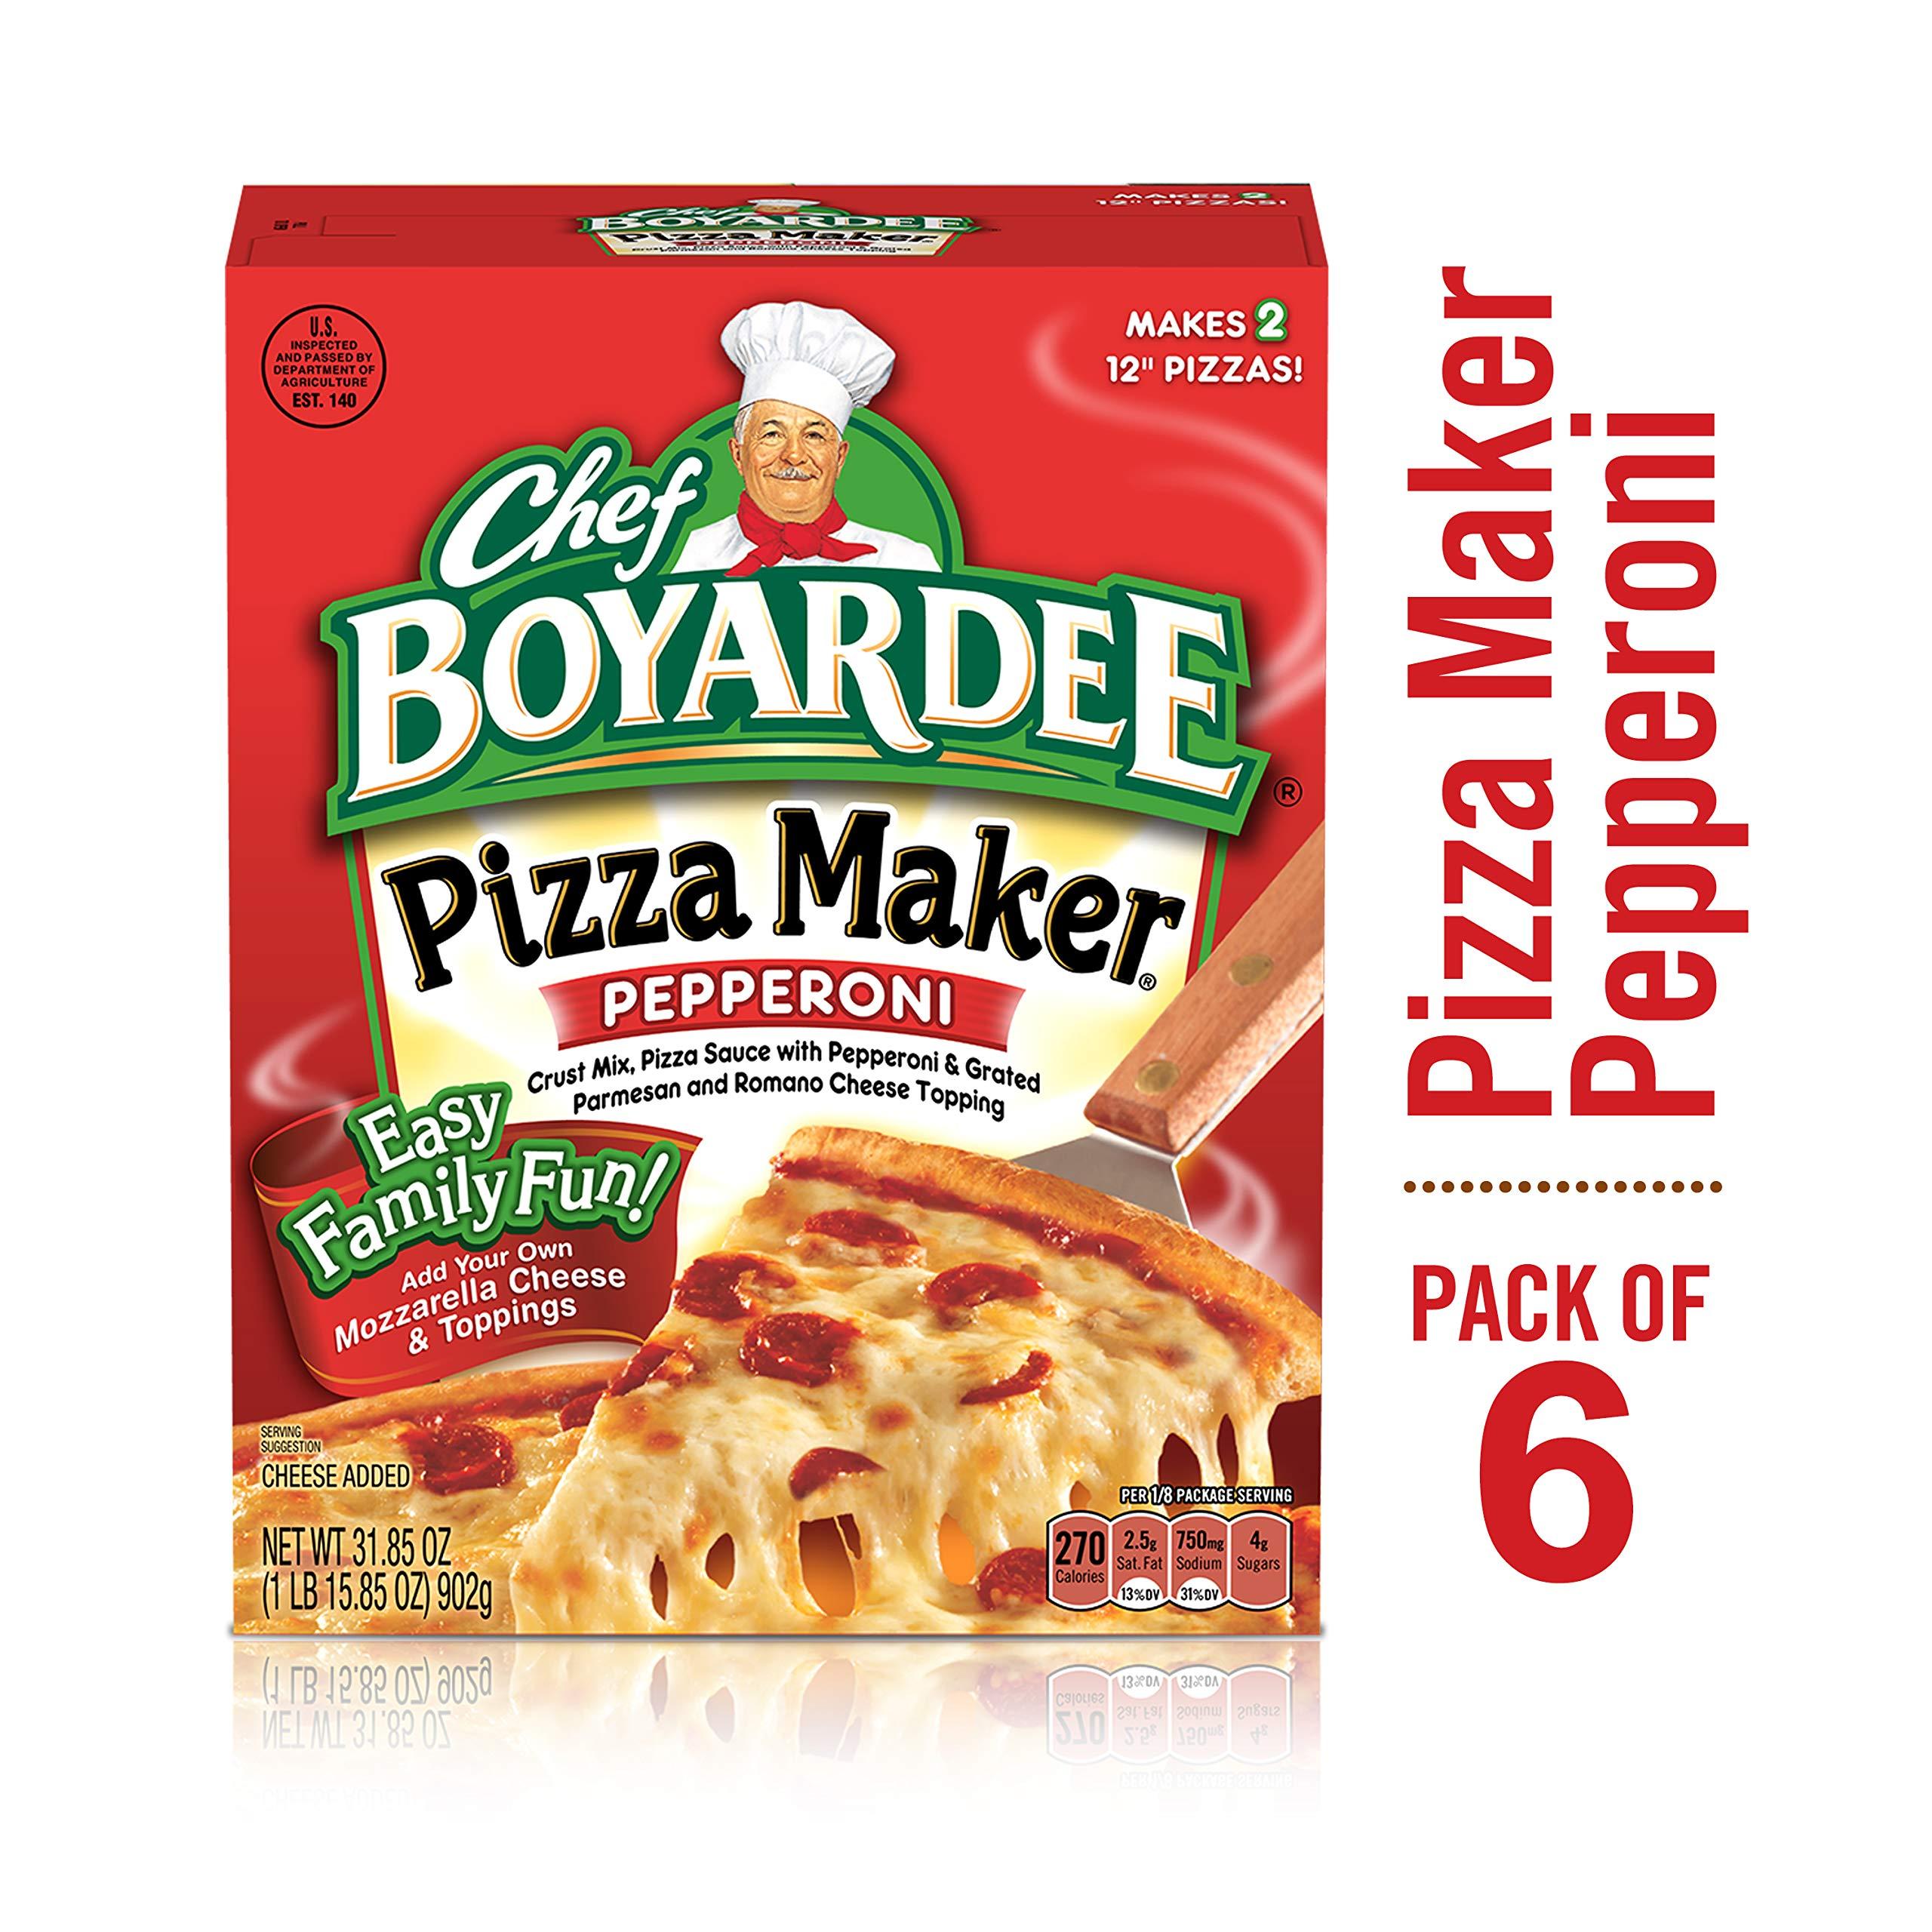 Chef Boyardee Pepperoni Pizza Maker, 31.85 oz, 6 Pack by Chef Boyardee